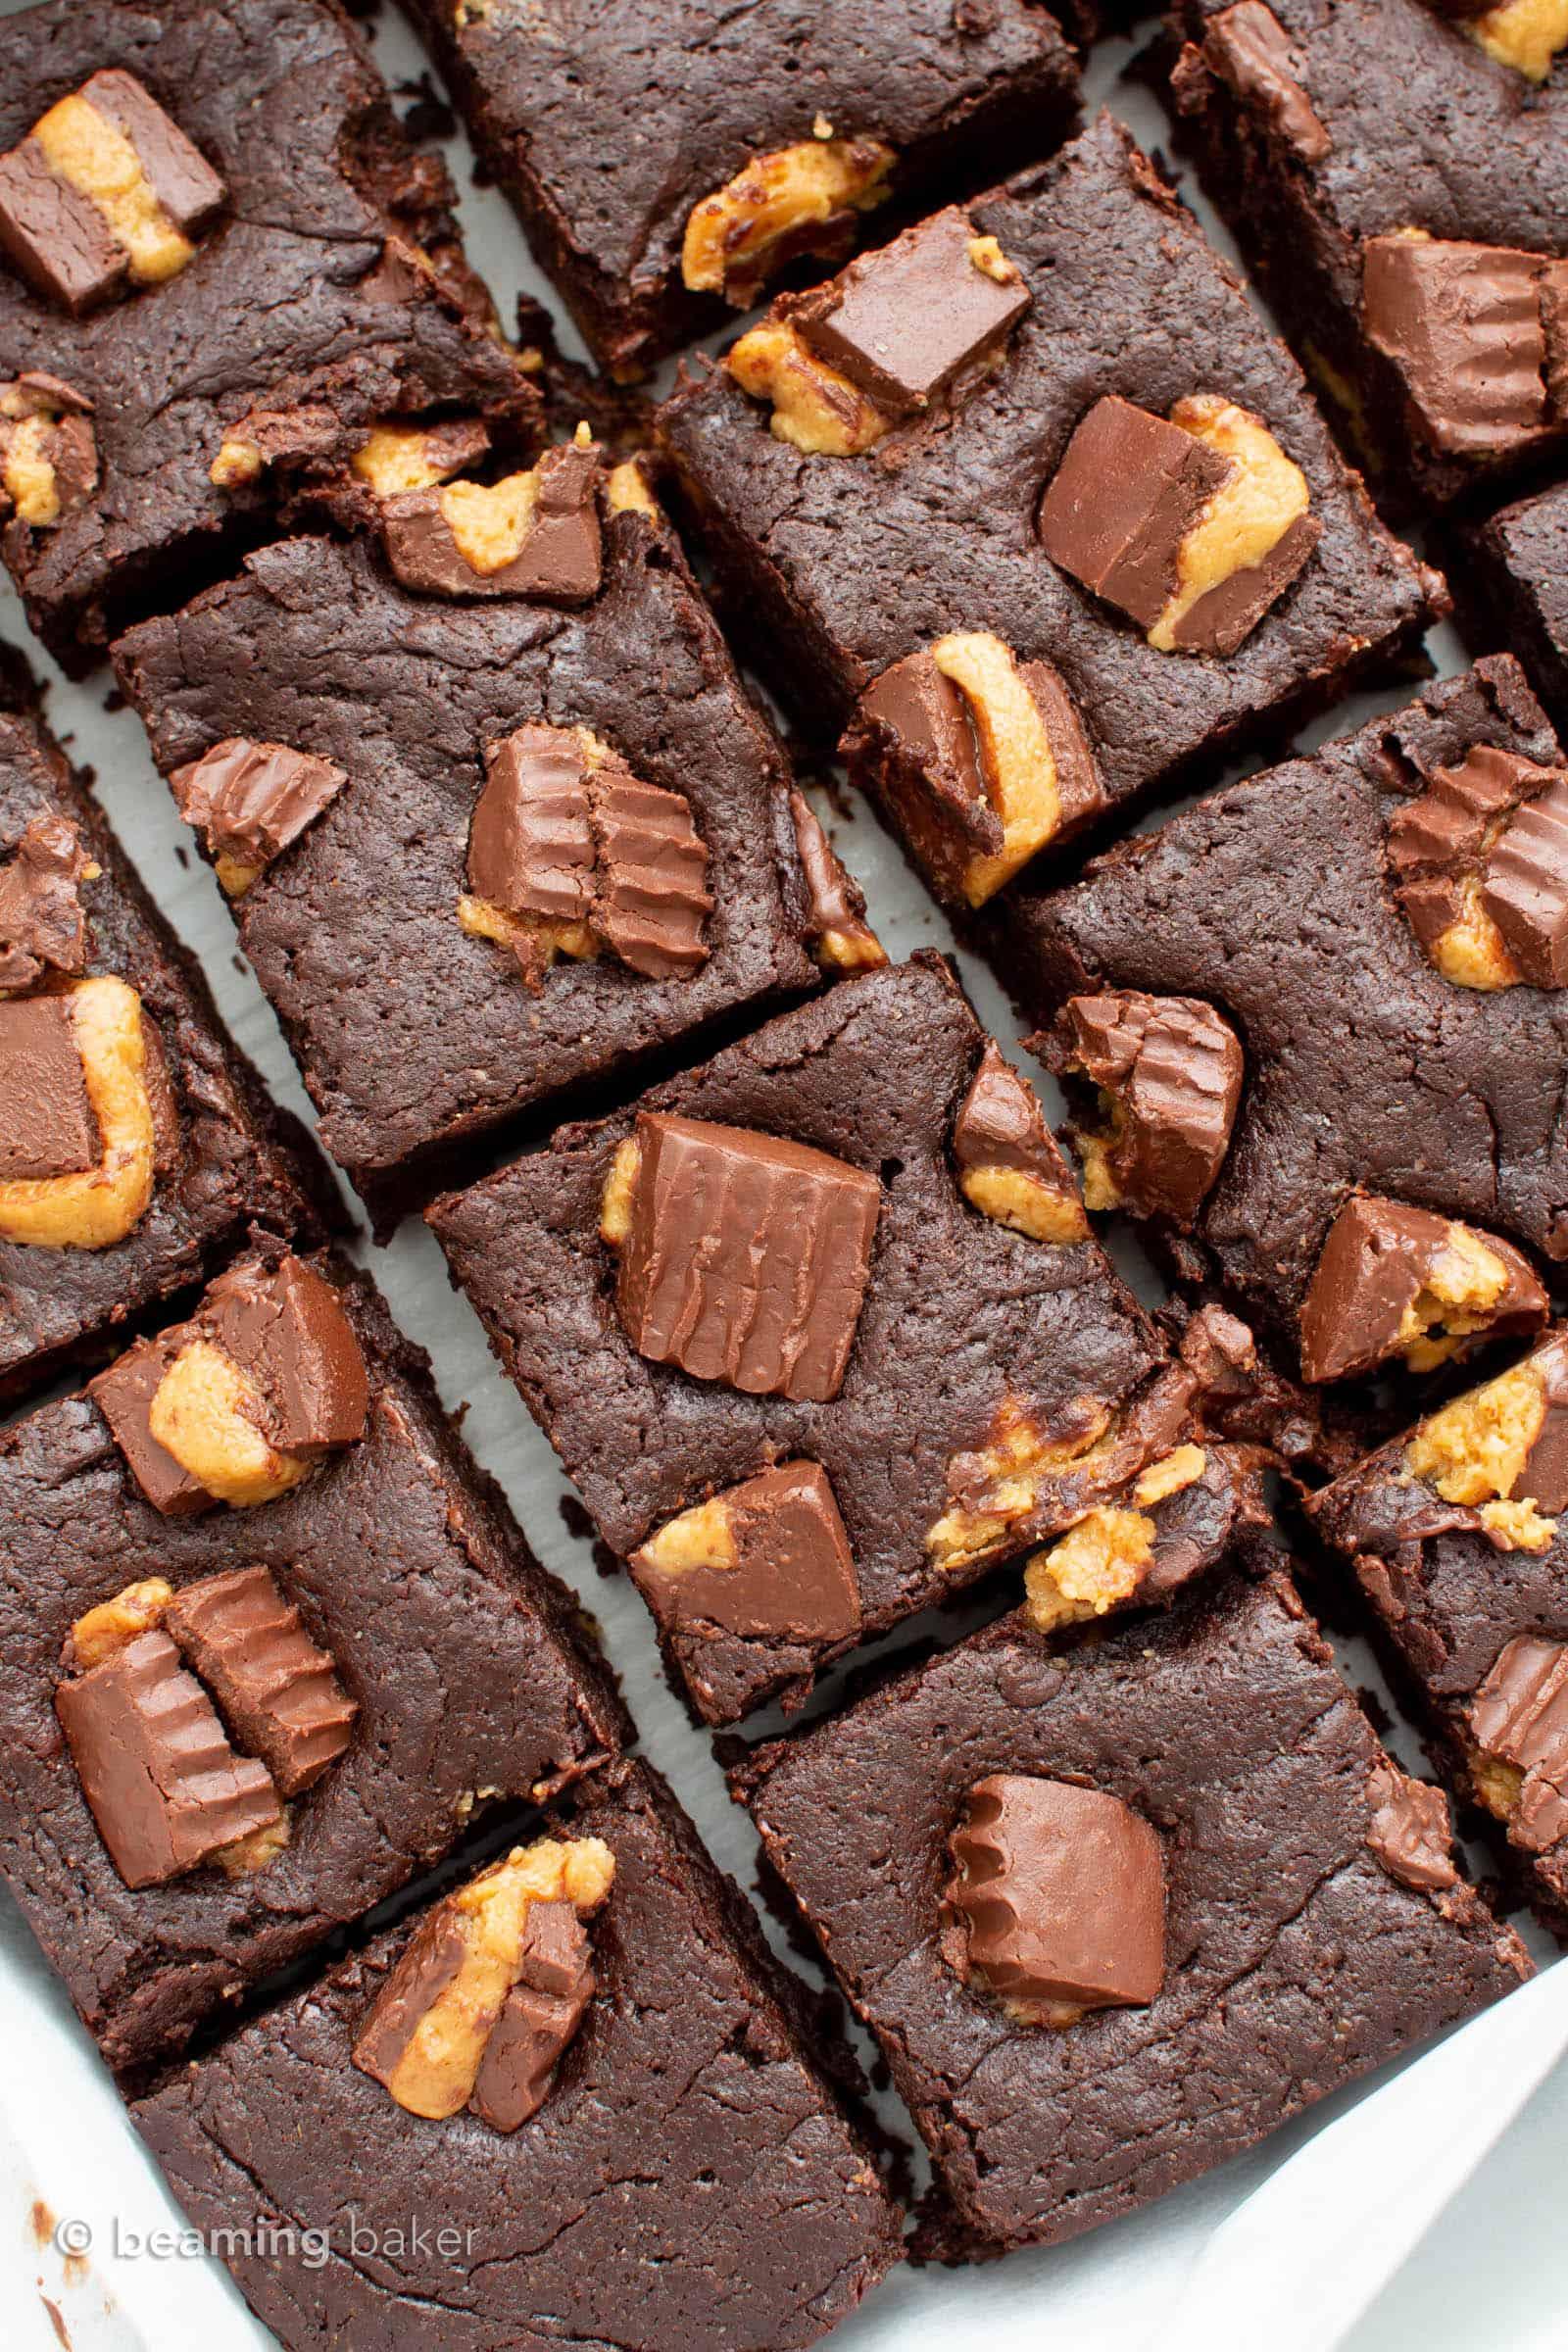 Vegan Peanut Butter Cup Brownies: moist 'n fudgy peanut butter cup brownies! These vegan peanut butter brownies are bursting with chocolate & peanut butter cups. #PeanutButter #Brownies #VeganBrownies #Vegan | Recipe at BeamingBaker.com